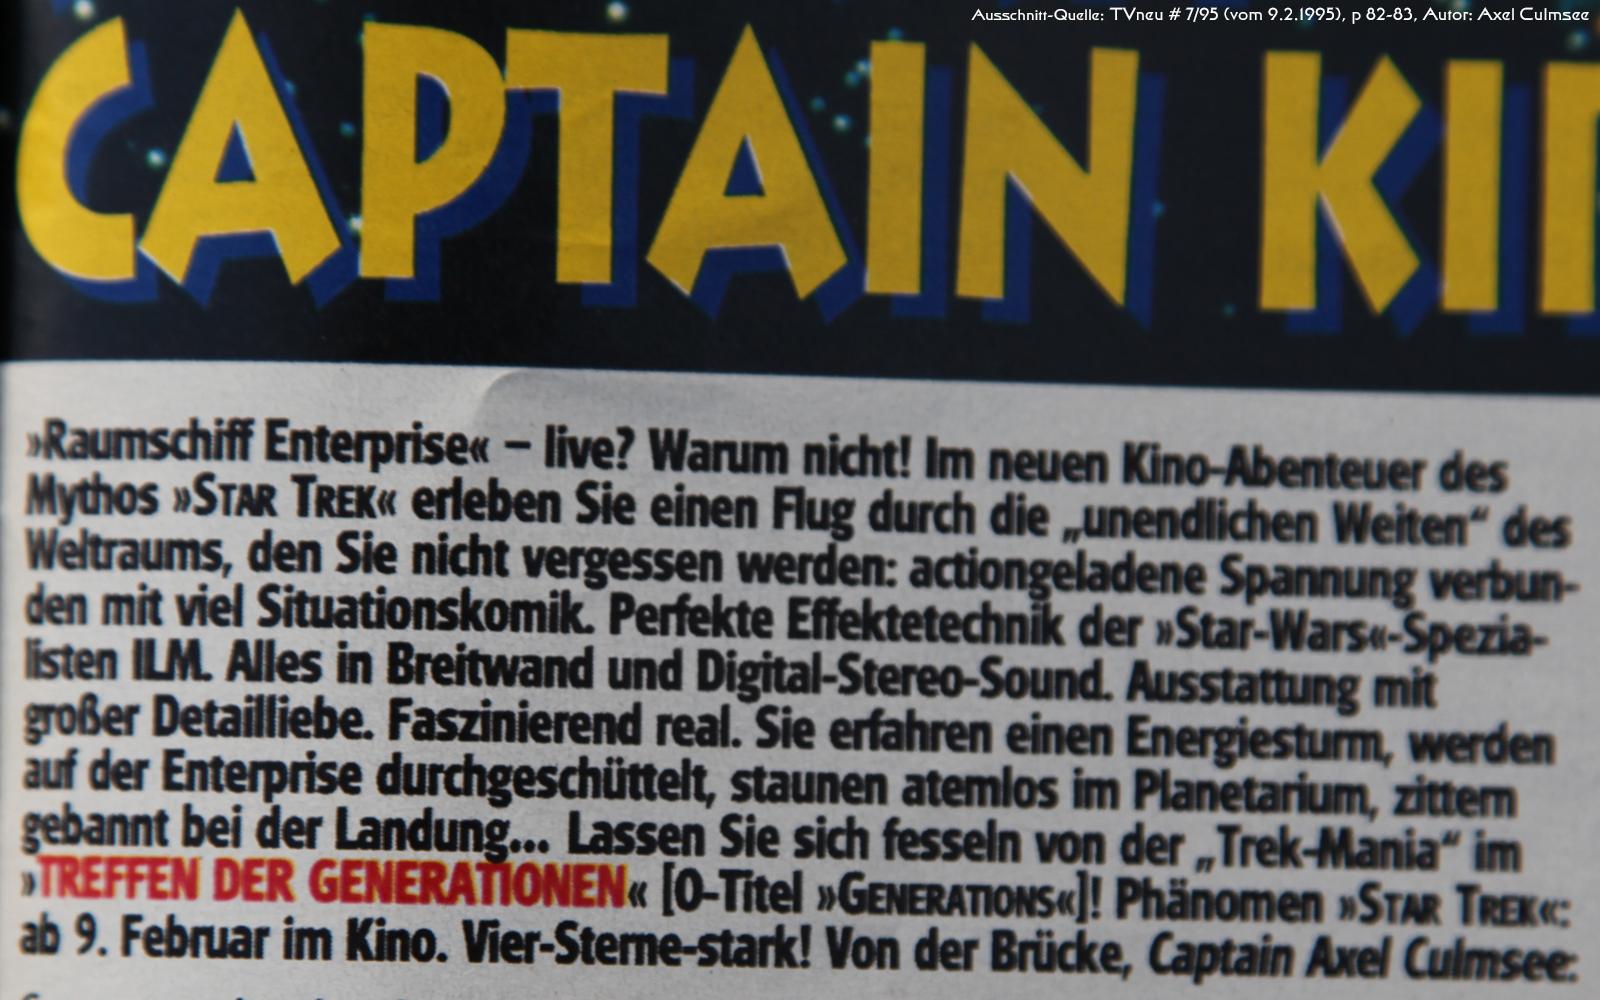 Star Trek Generations-Artikel in TVneu 7-1995 Ausschnitt Teaser